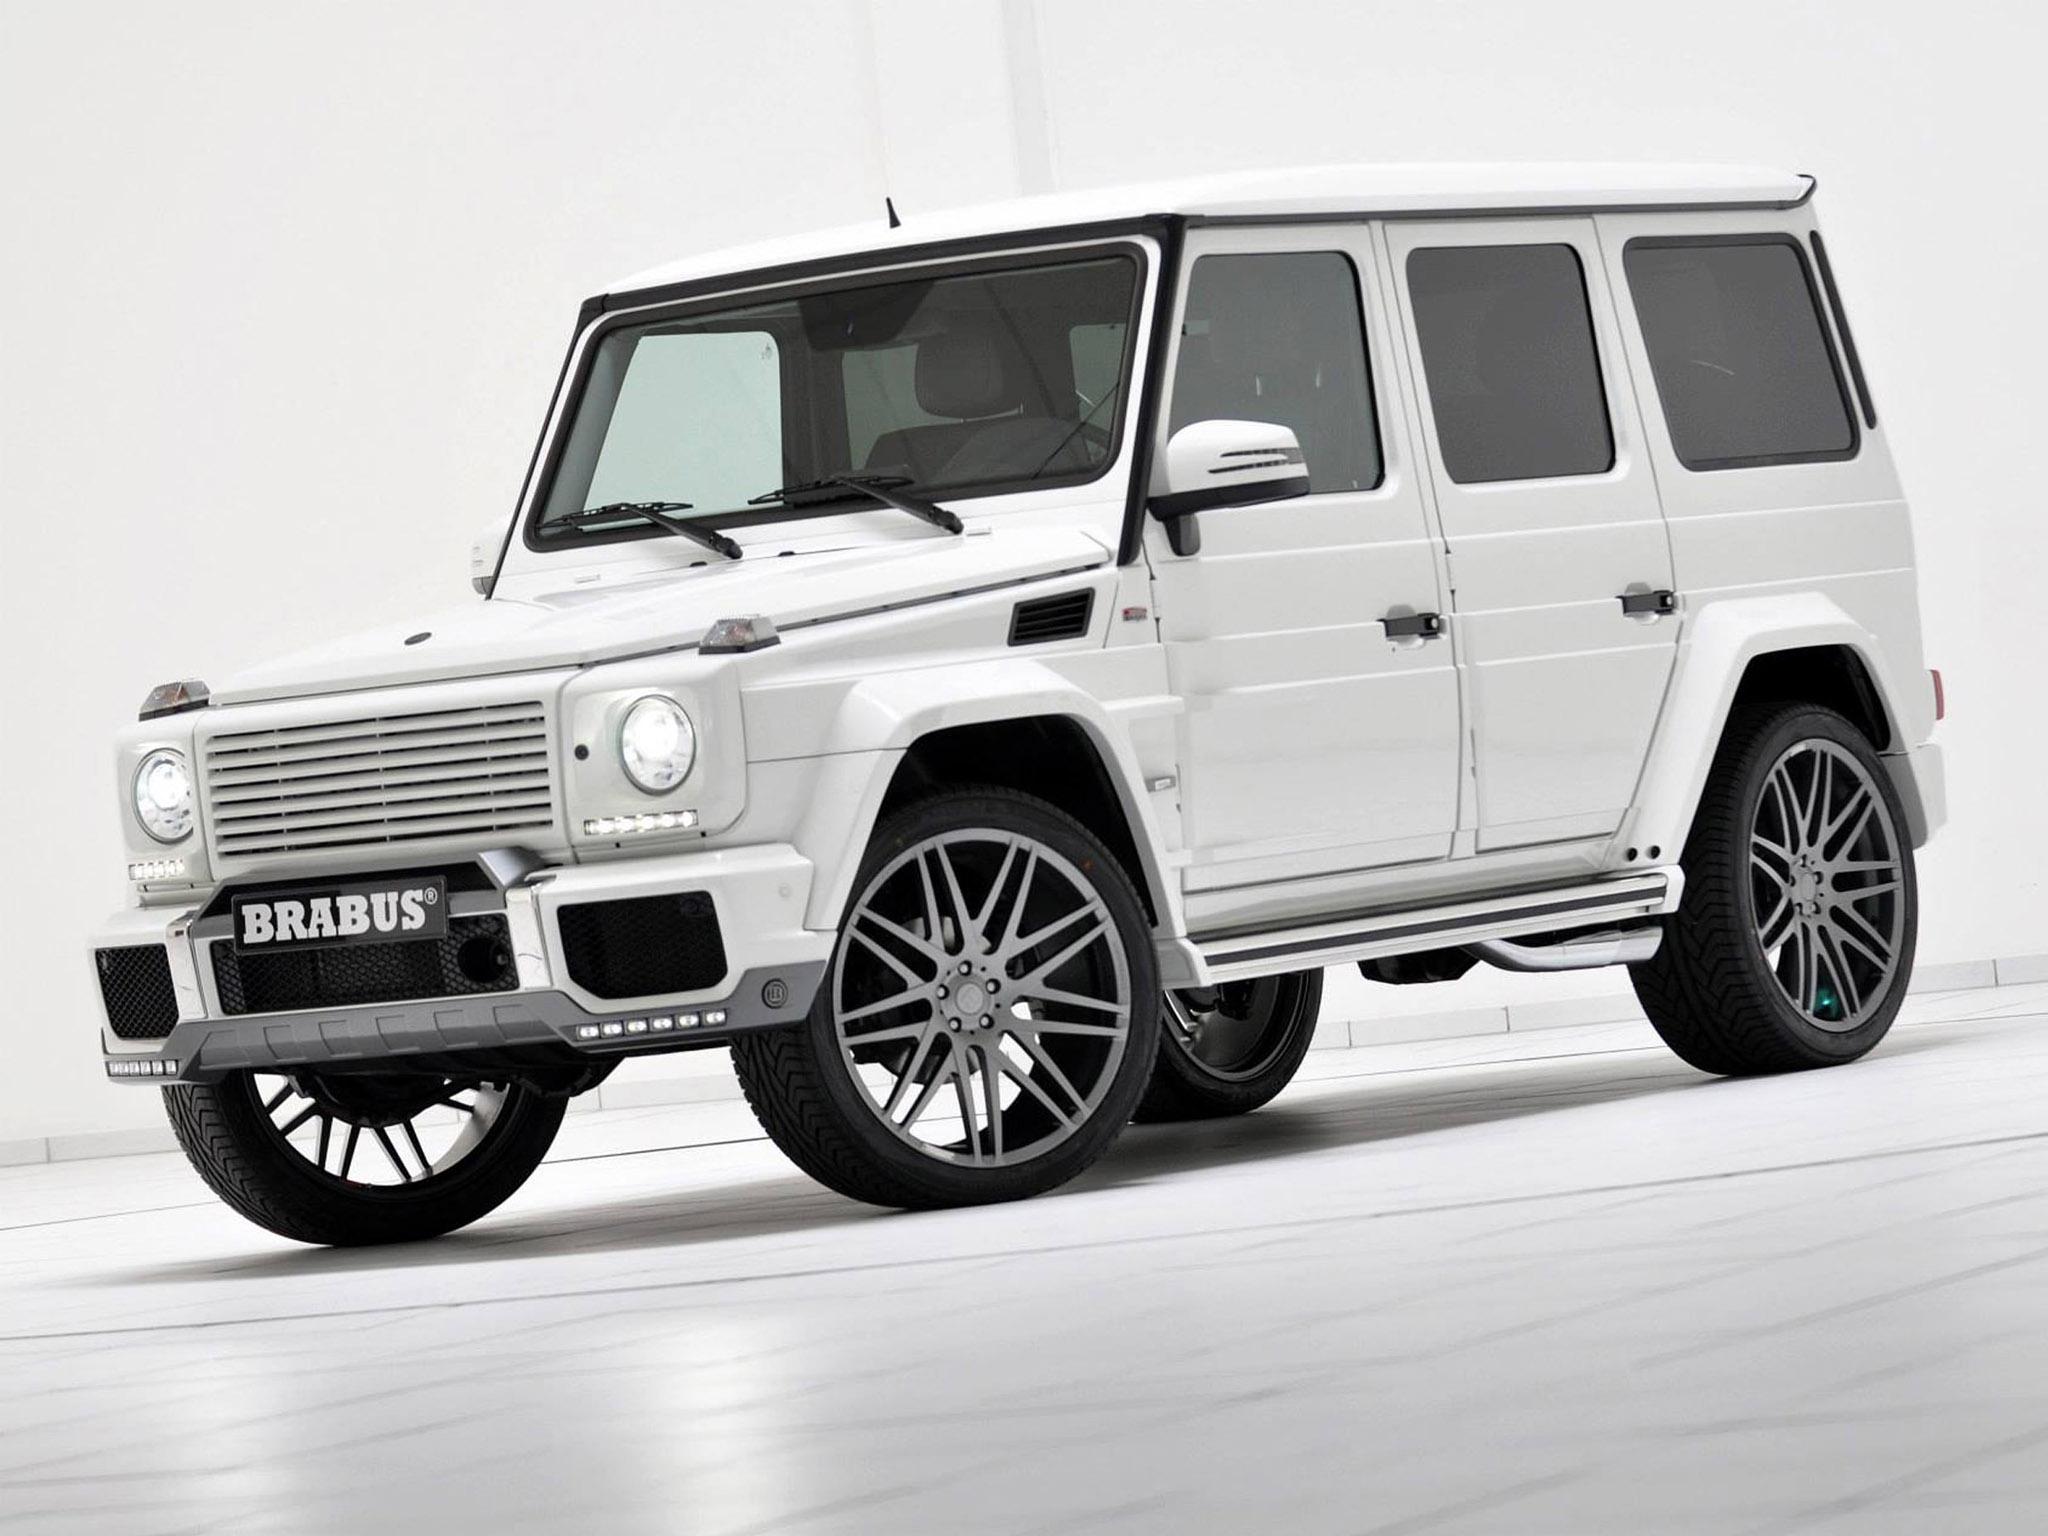 2013 brabus widestar mercedes benz g class 350 cdi suv tuning f wallpaper 2048x1536 123629 wallpaperup - Black Mercedes Benz Suv 2013